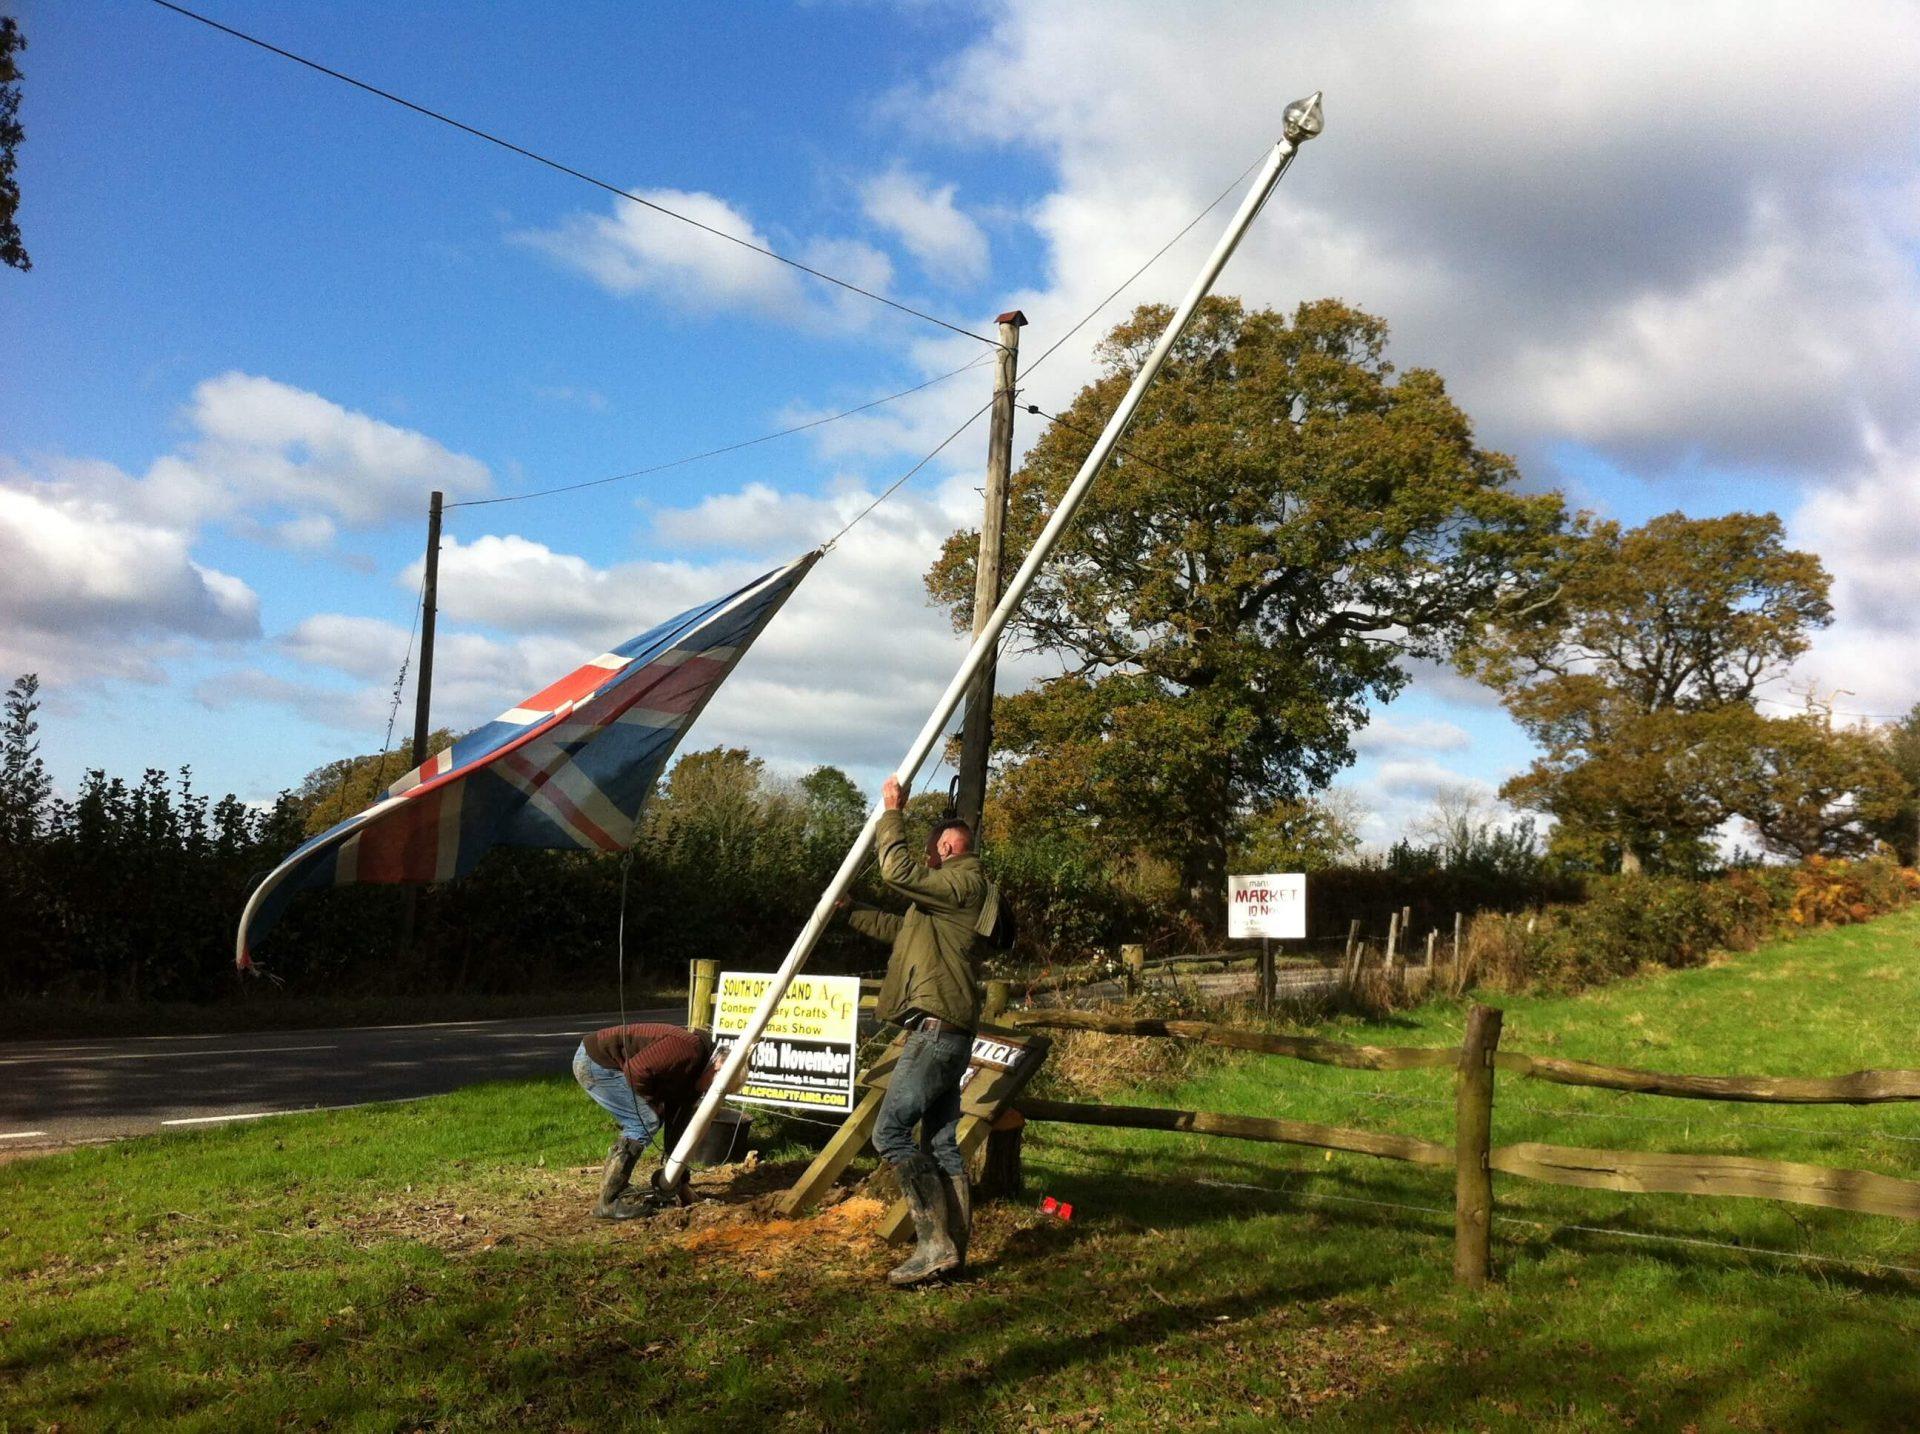 Flagpole Fun at the SendMe Plantation